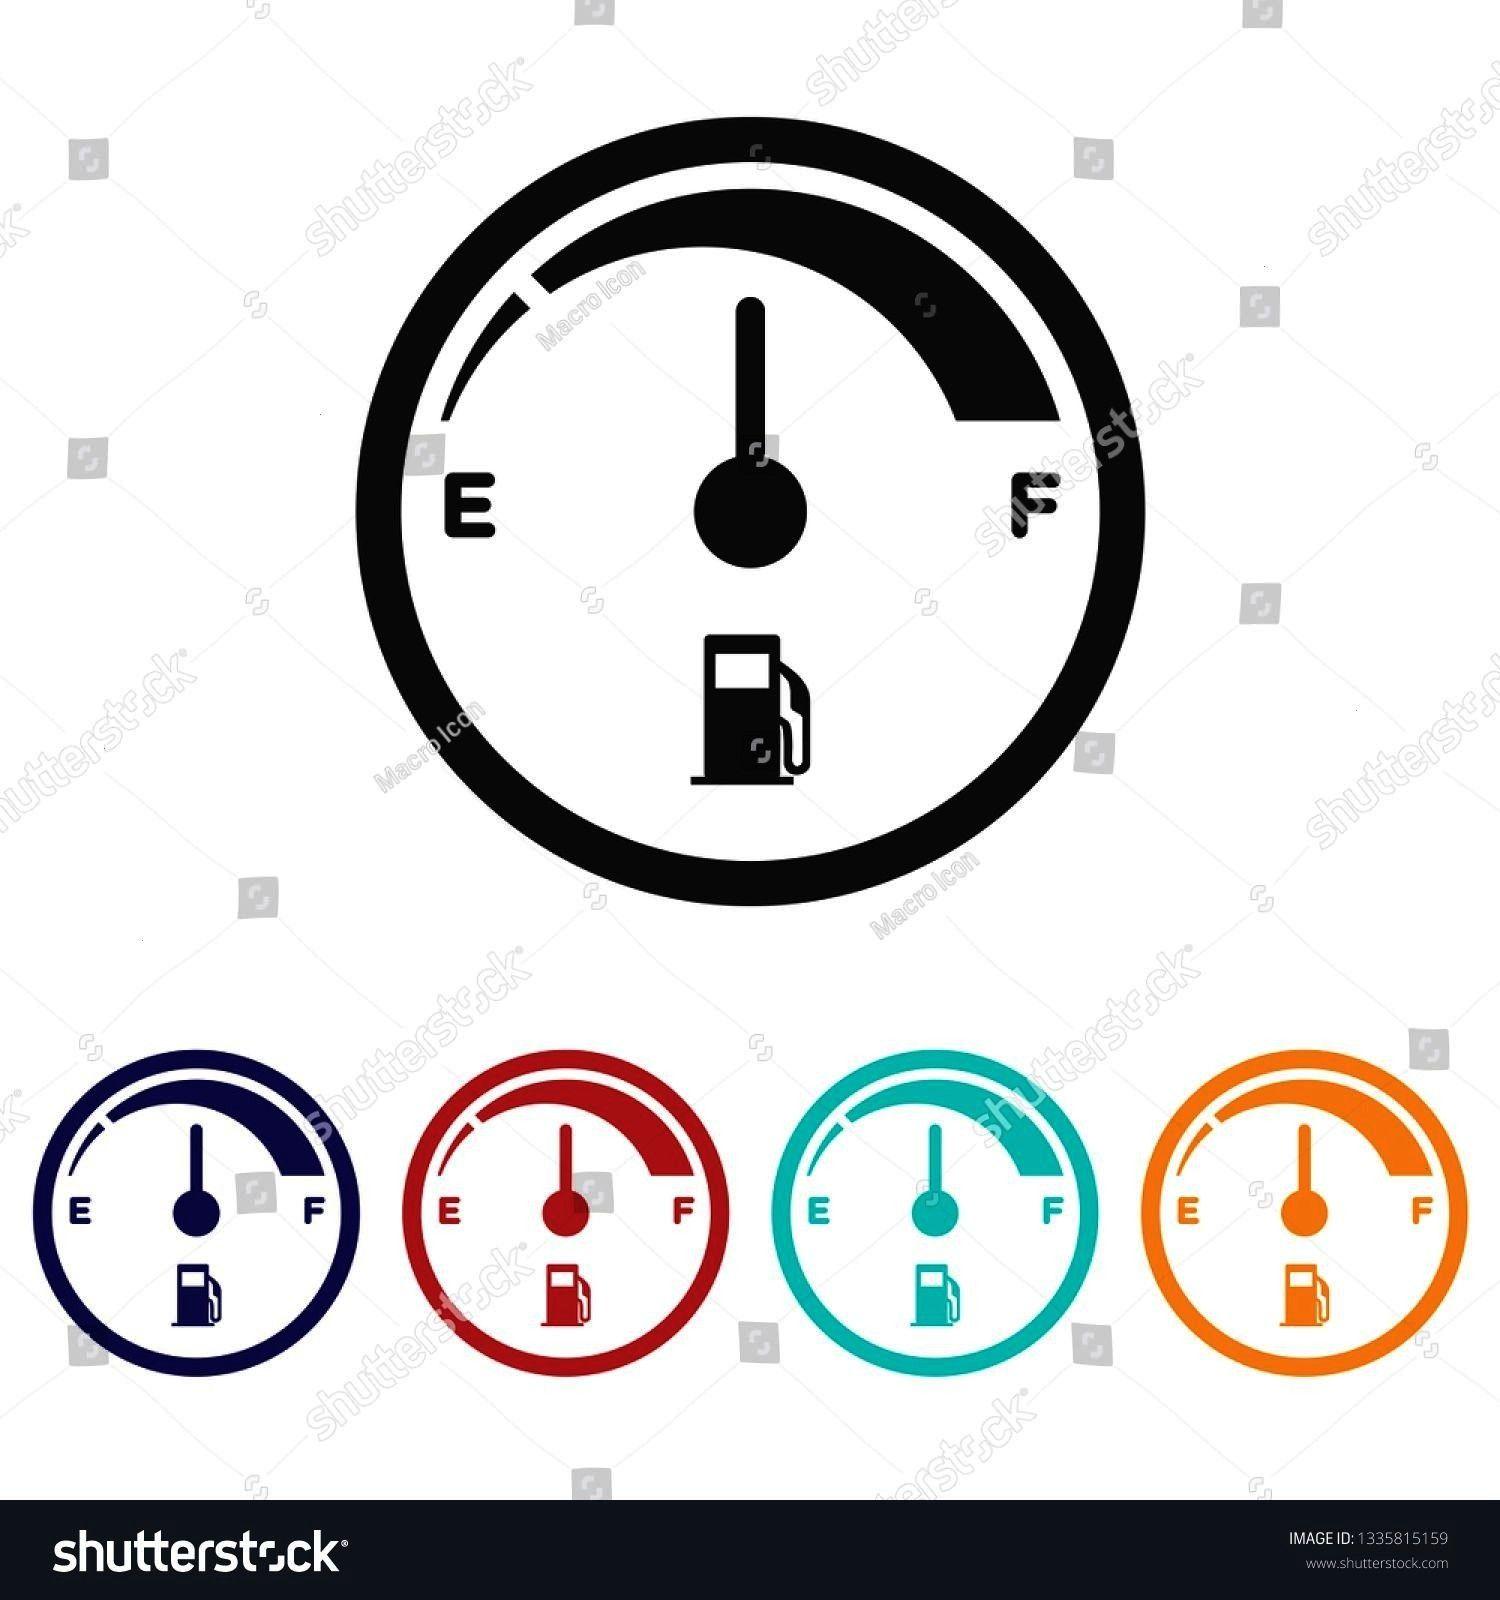 icon.Fuel indicator vector sign.Fuel consumption symbol ,Fuel gauge icon.Fuel indicator vector sign